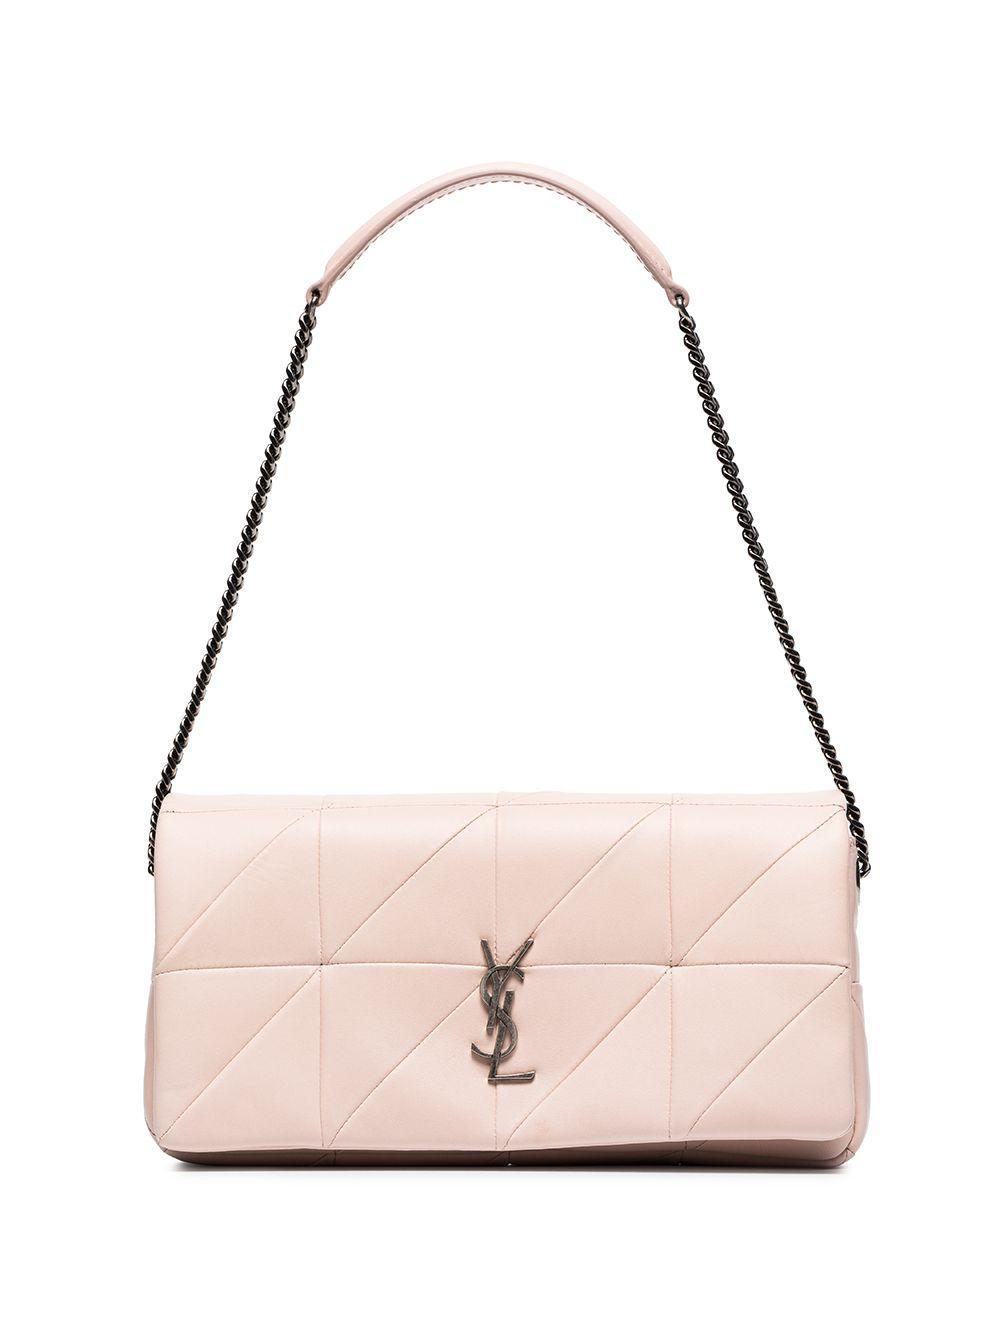 Jamie Shoulder Bag Item # 605026COP64